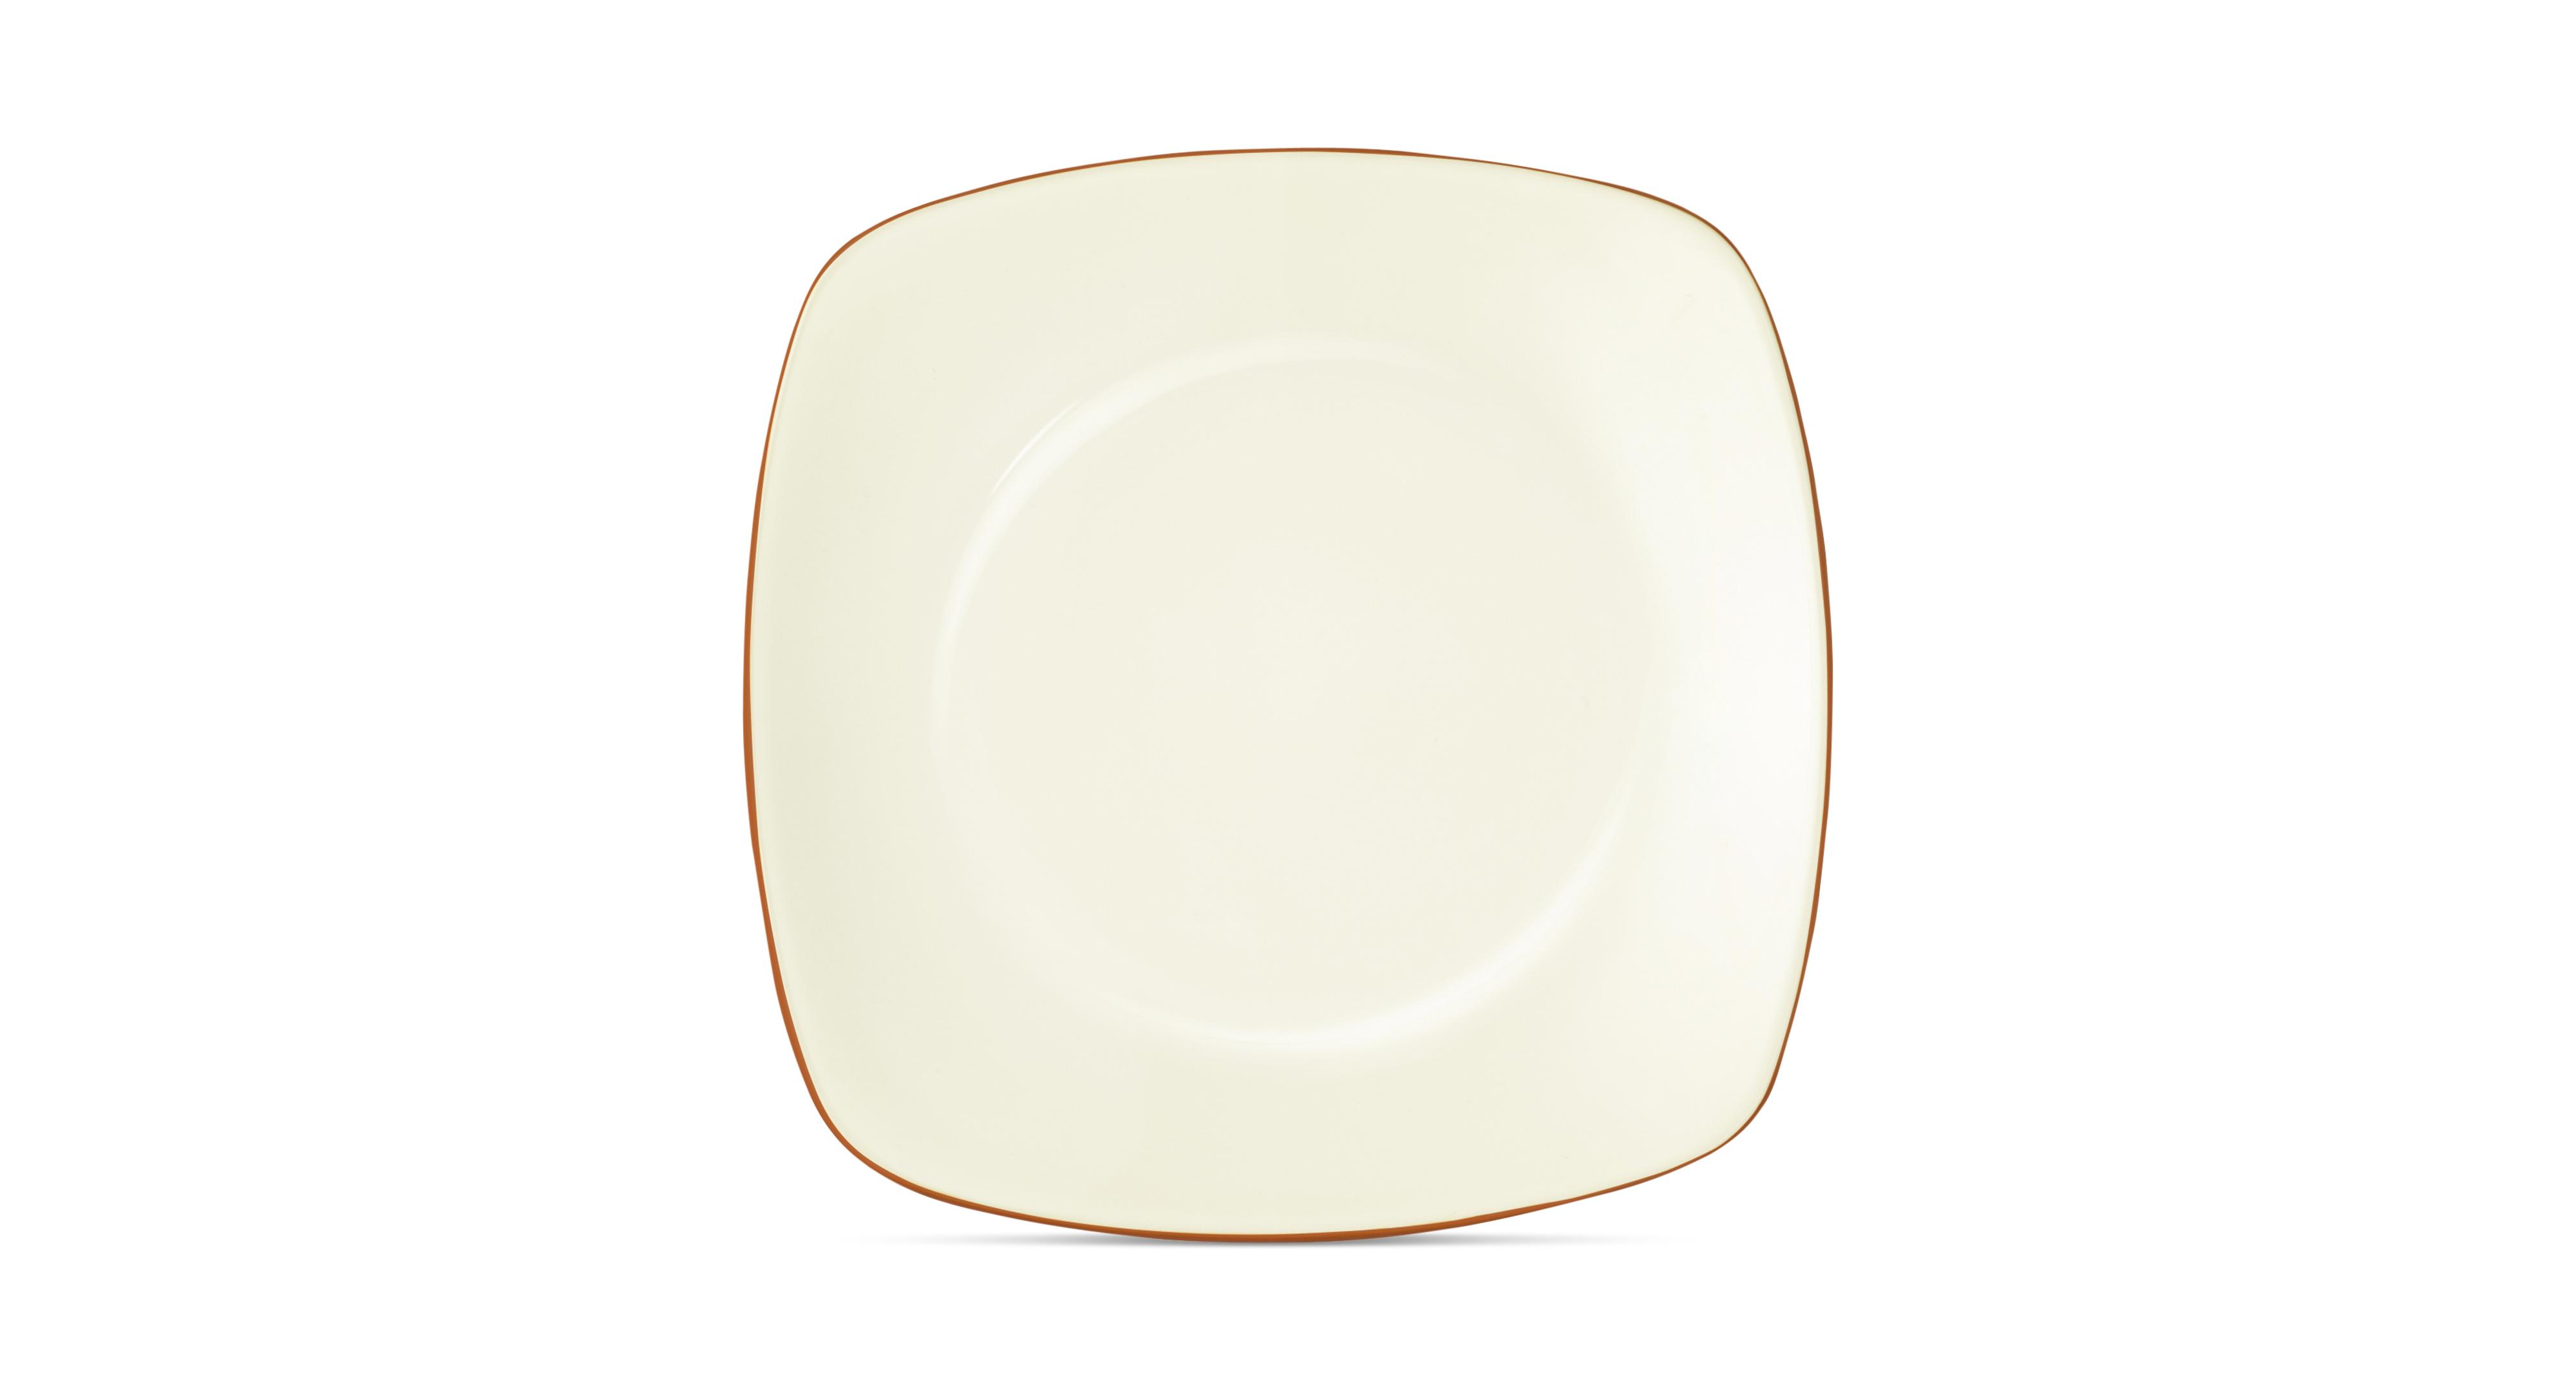 Noritake Dinnerware, Colorwave Terra Cotta Square Platter